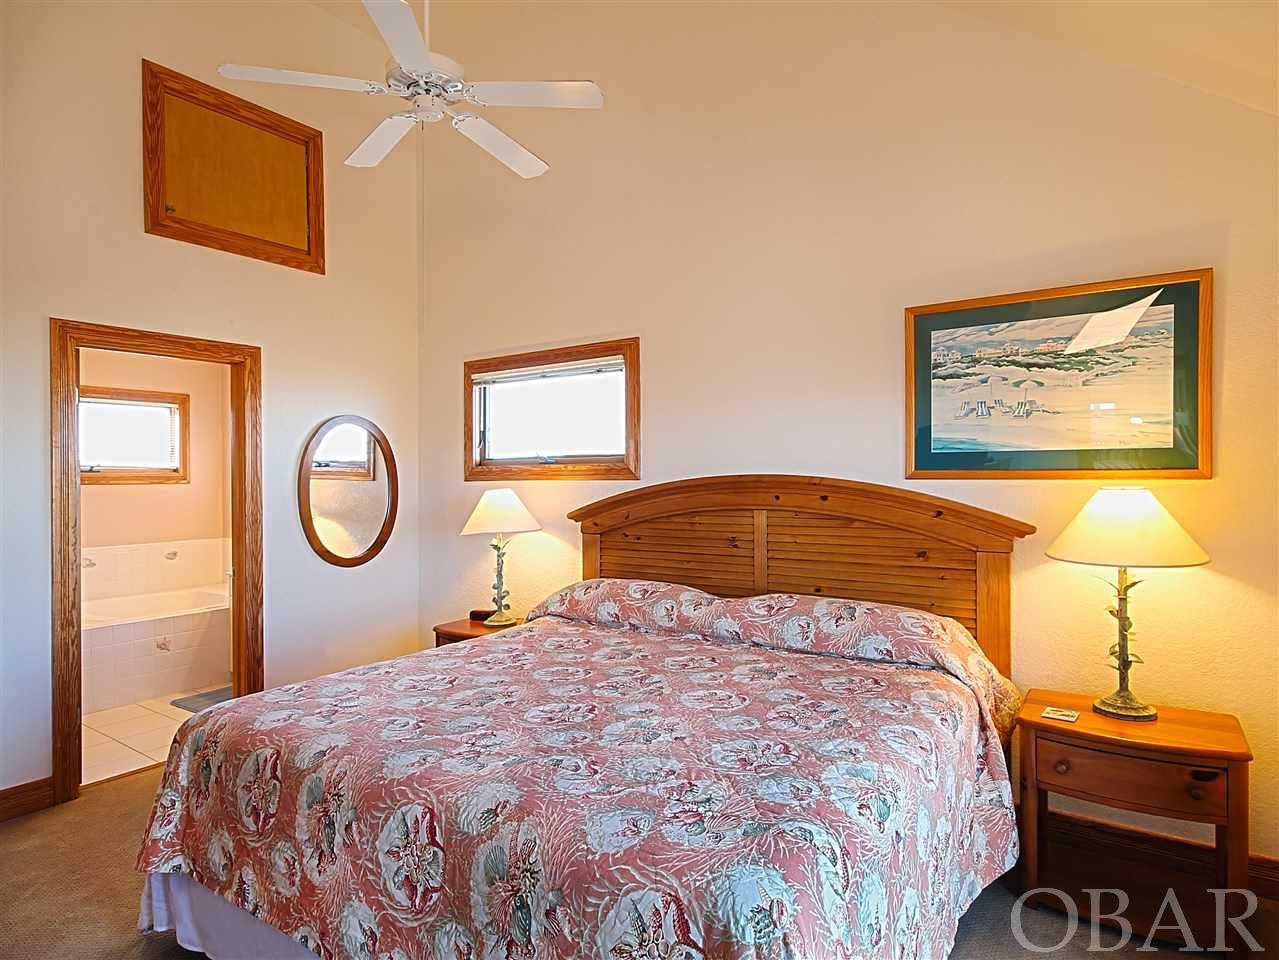 1267 Windance Lane,Corolla,NC 27927,6 Bedrooms Bedrooms,5 BathroomsBathrooms,Residential,Windance Lane,97209